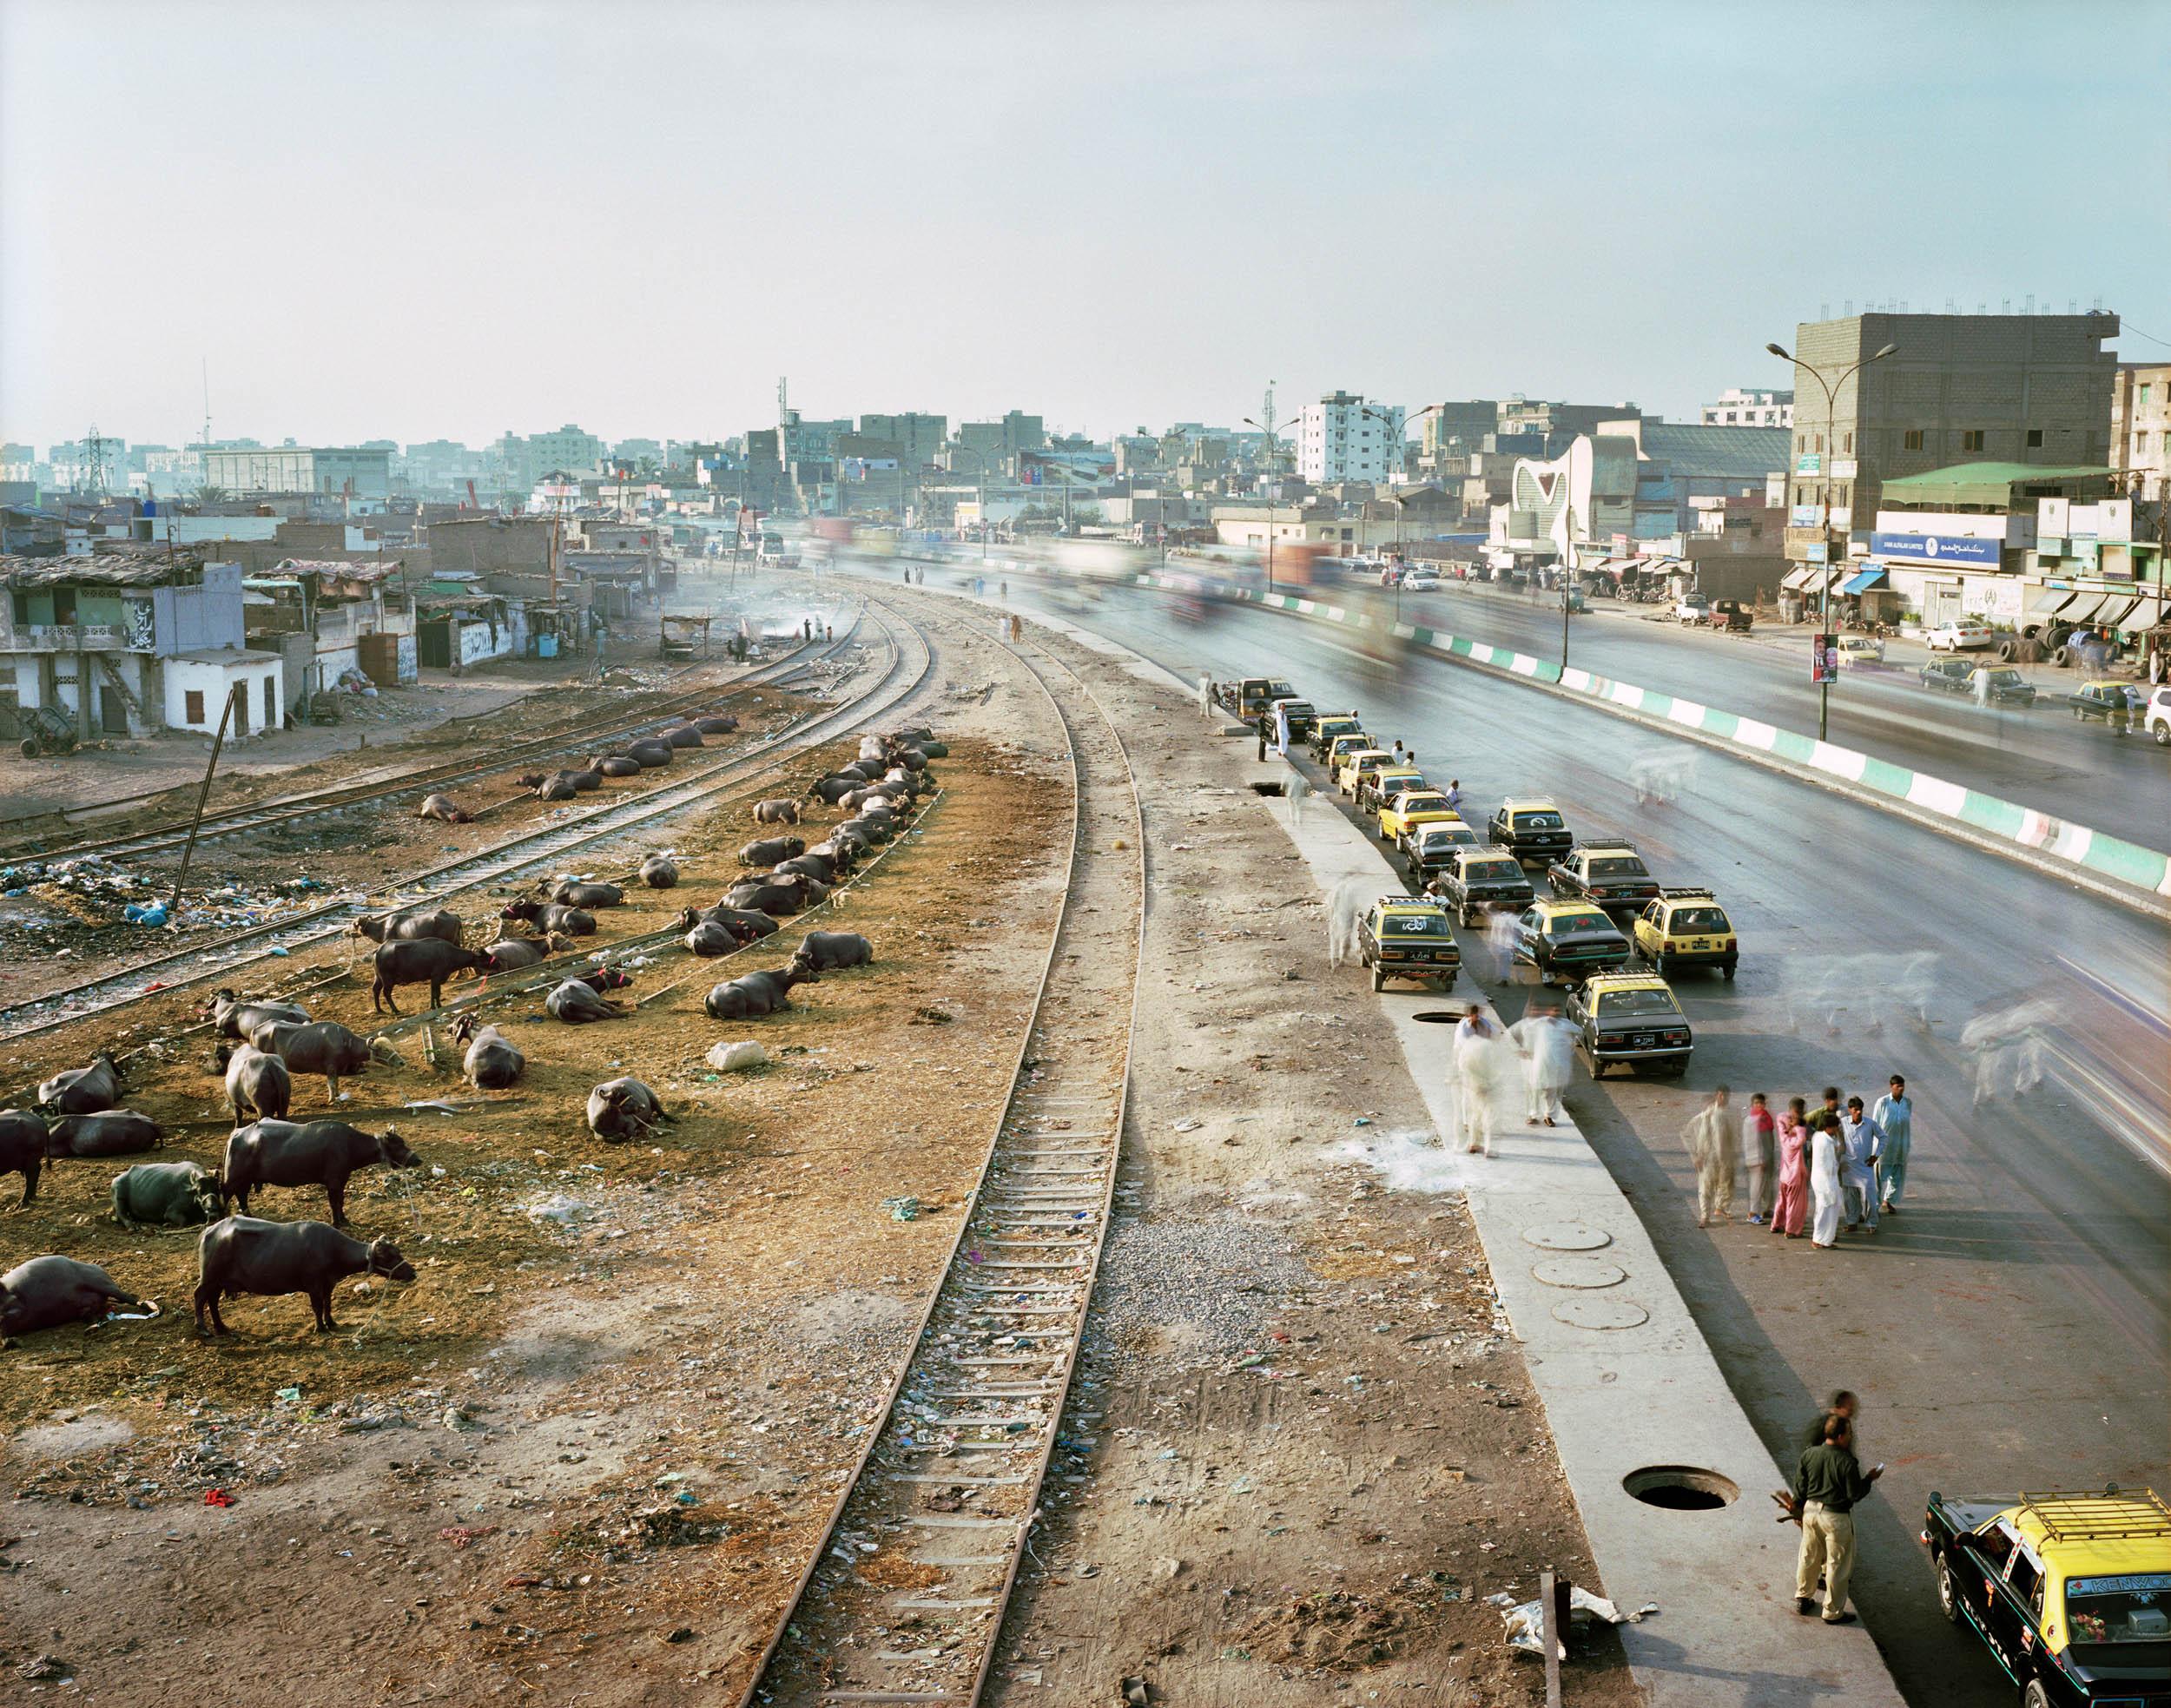 Mauripur Road, Machar Colony, Karachi, Pakistan